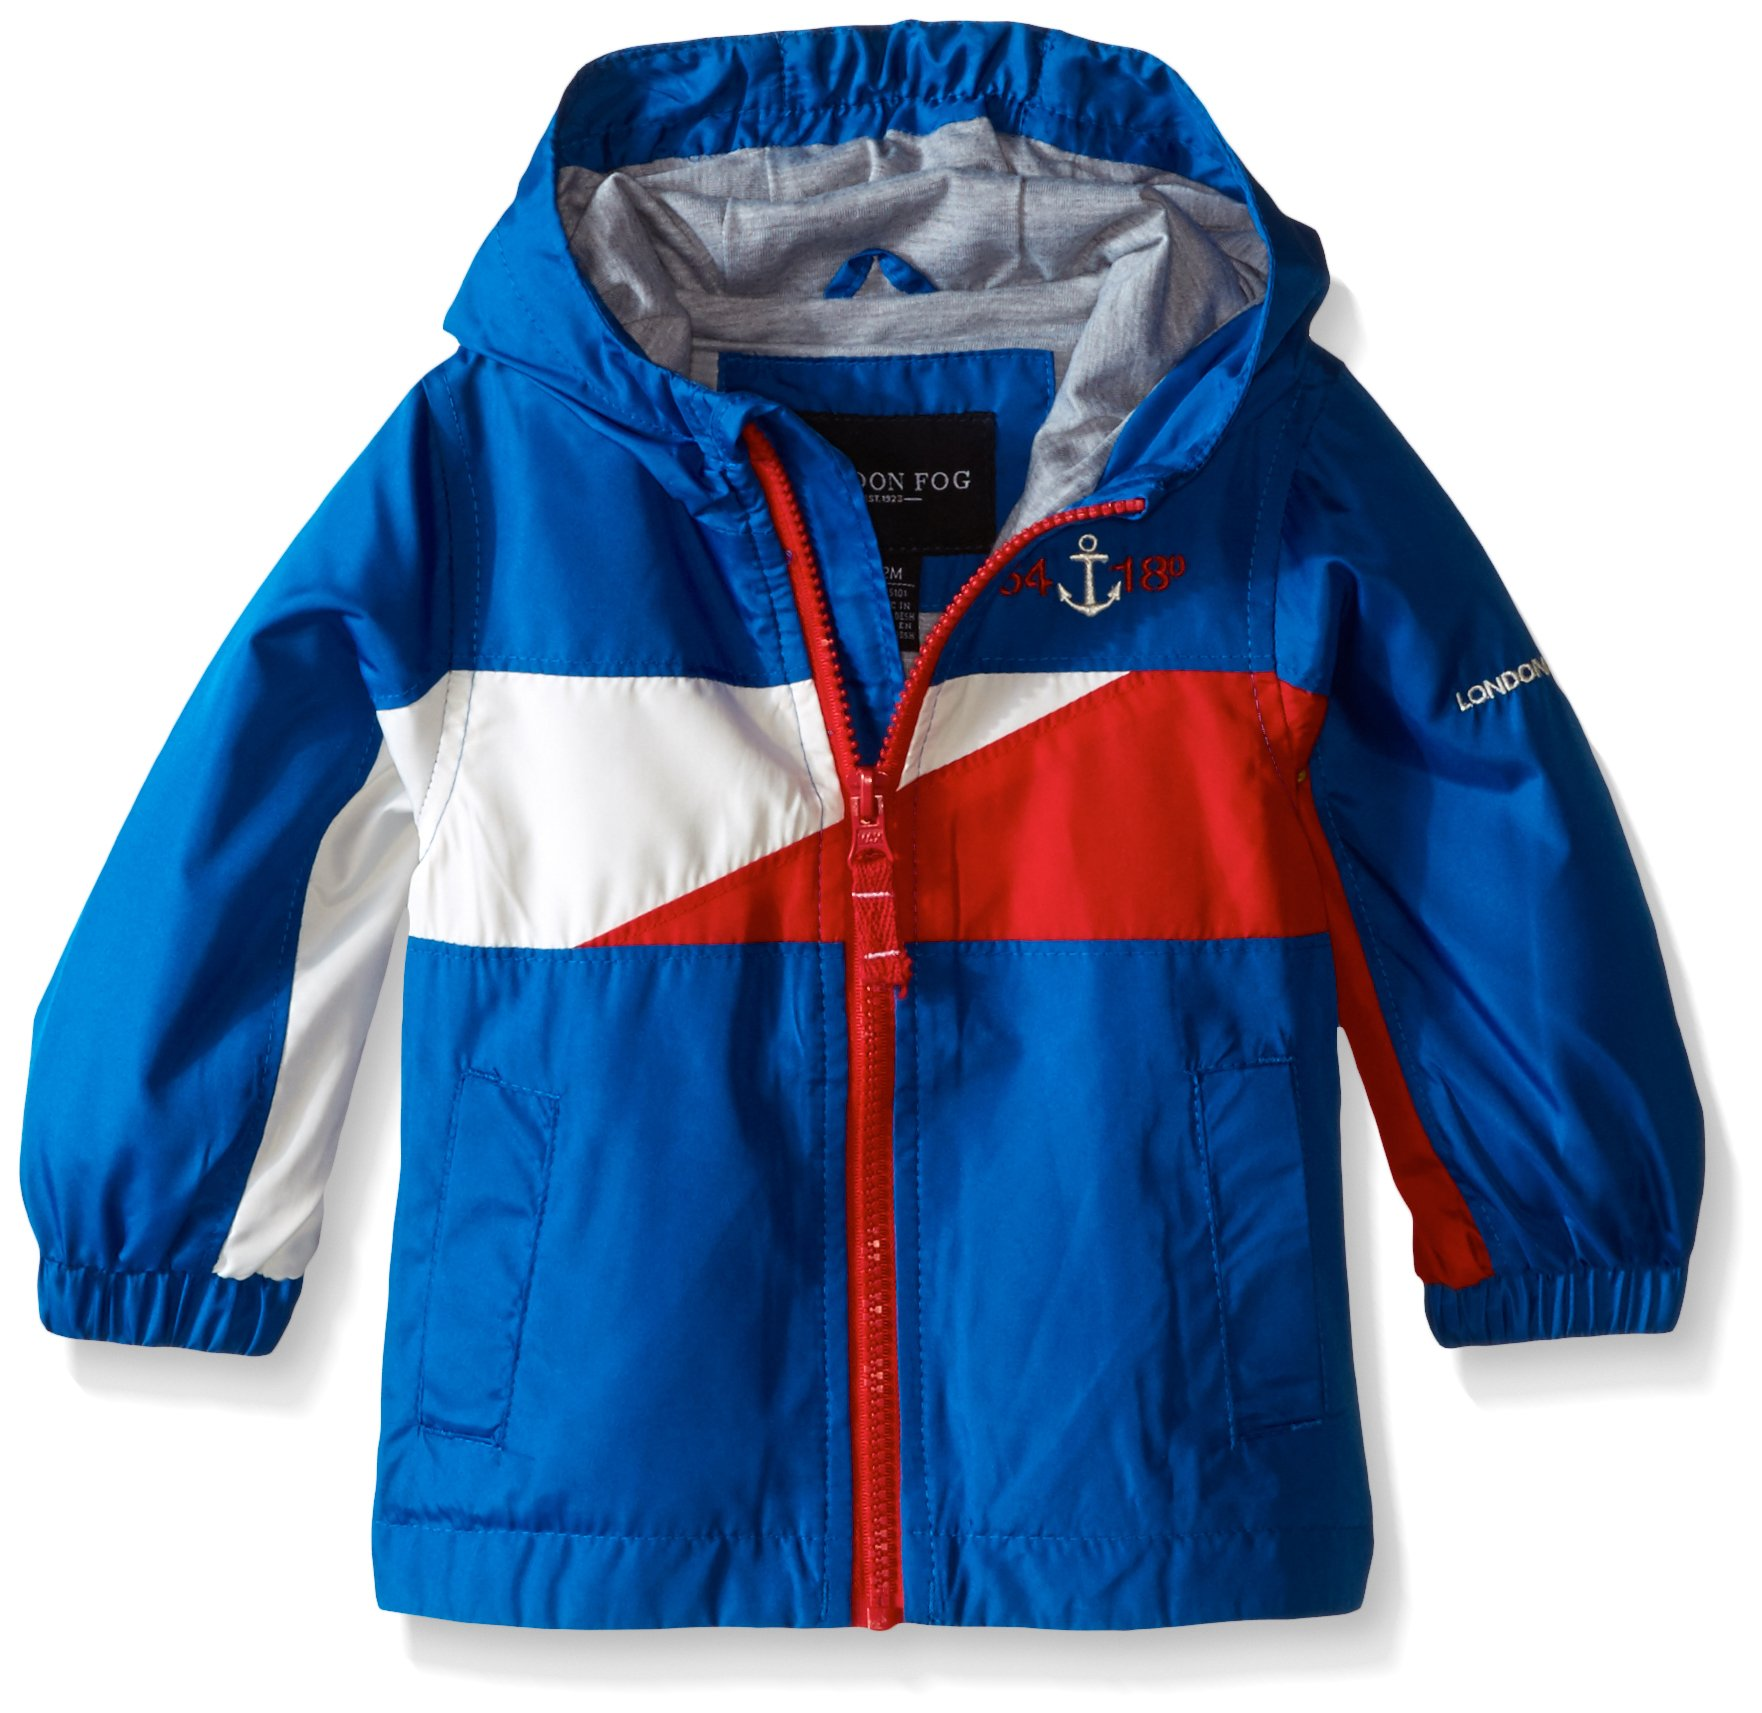 London Fog Baby-Boys Lightweight Jersey Lined Jacket Blue 12 Months 4